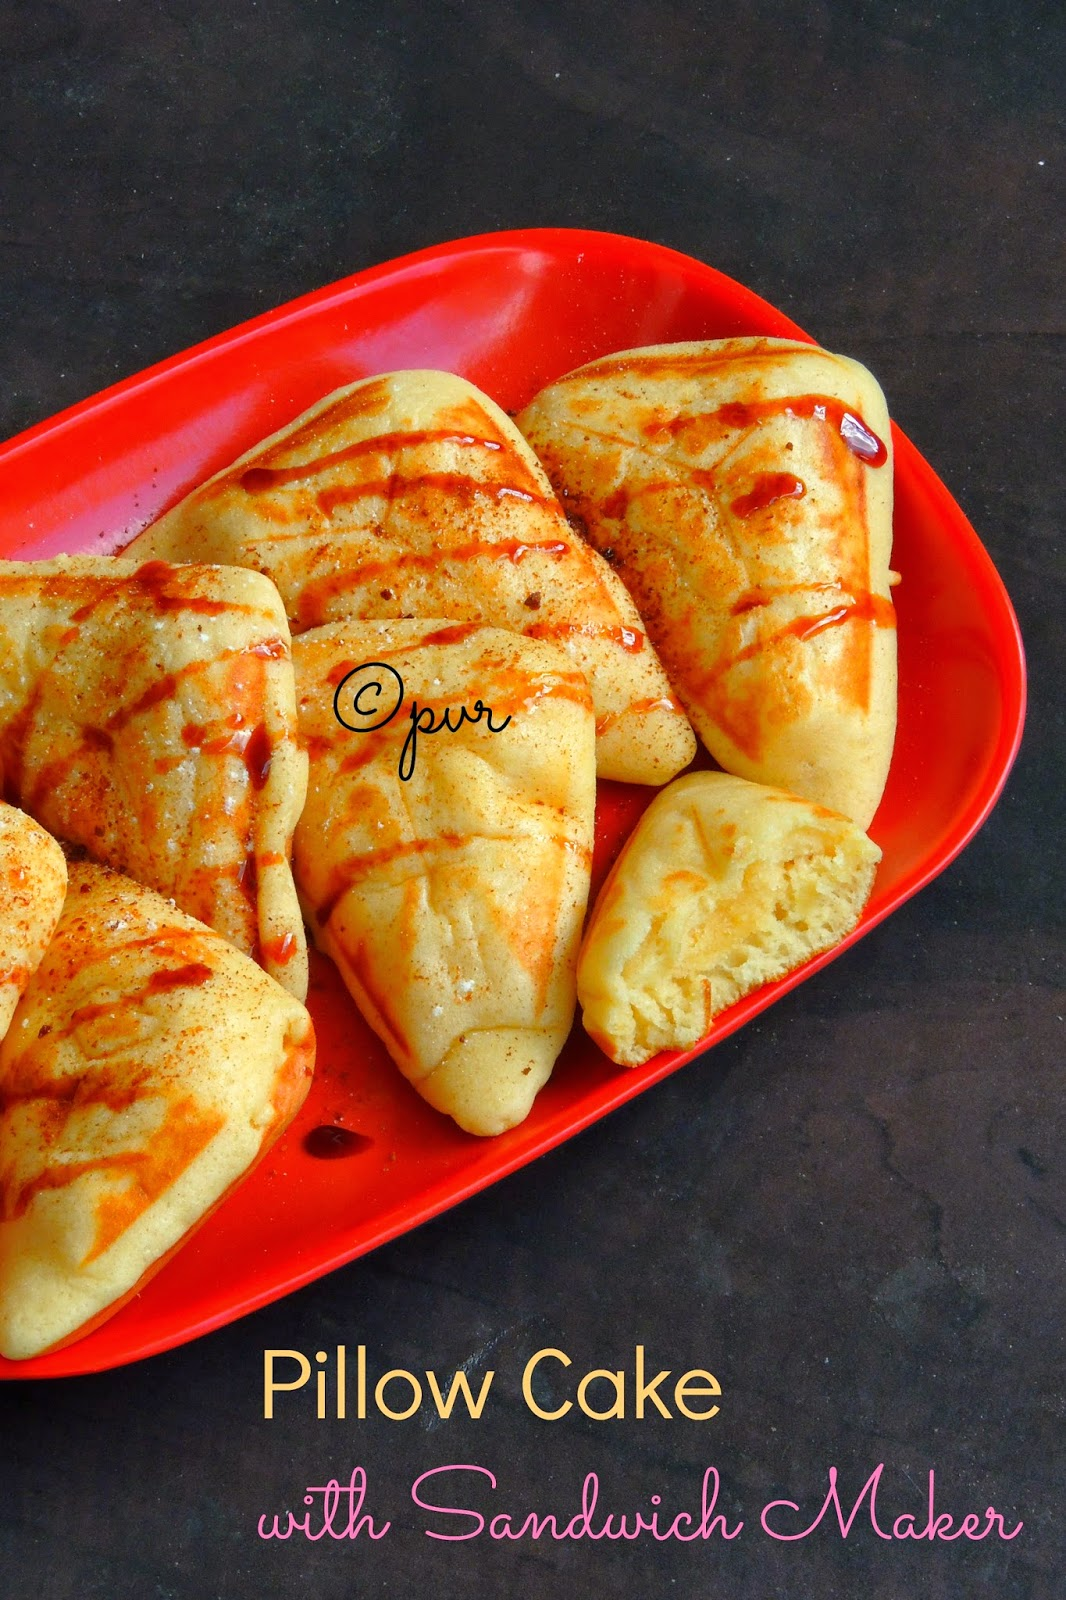 Priya S Versatile Recipes Pillow Cake With Sandwich Maker